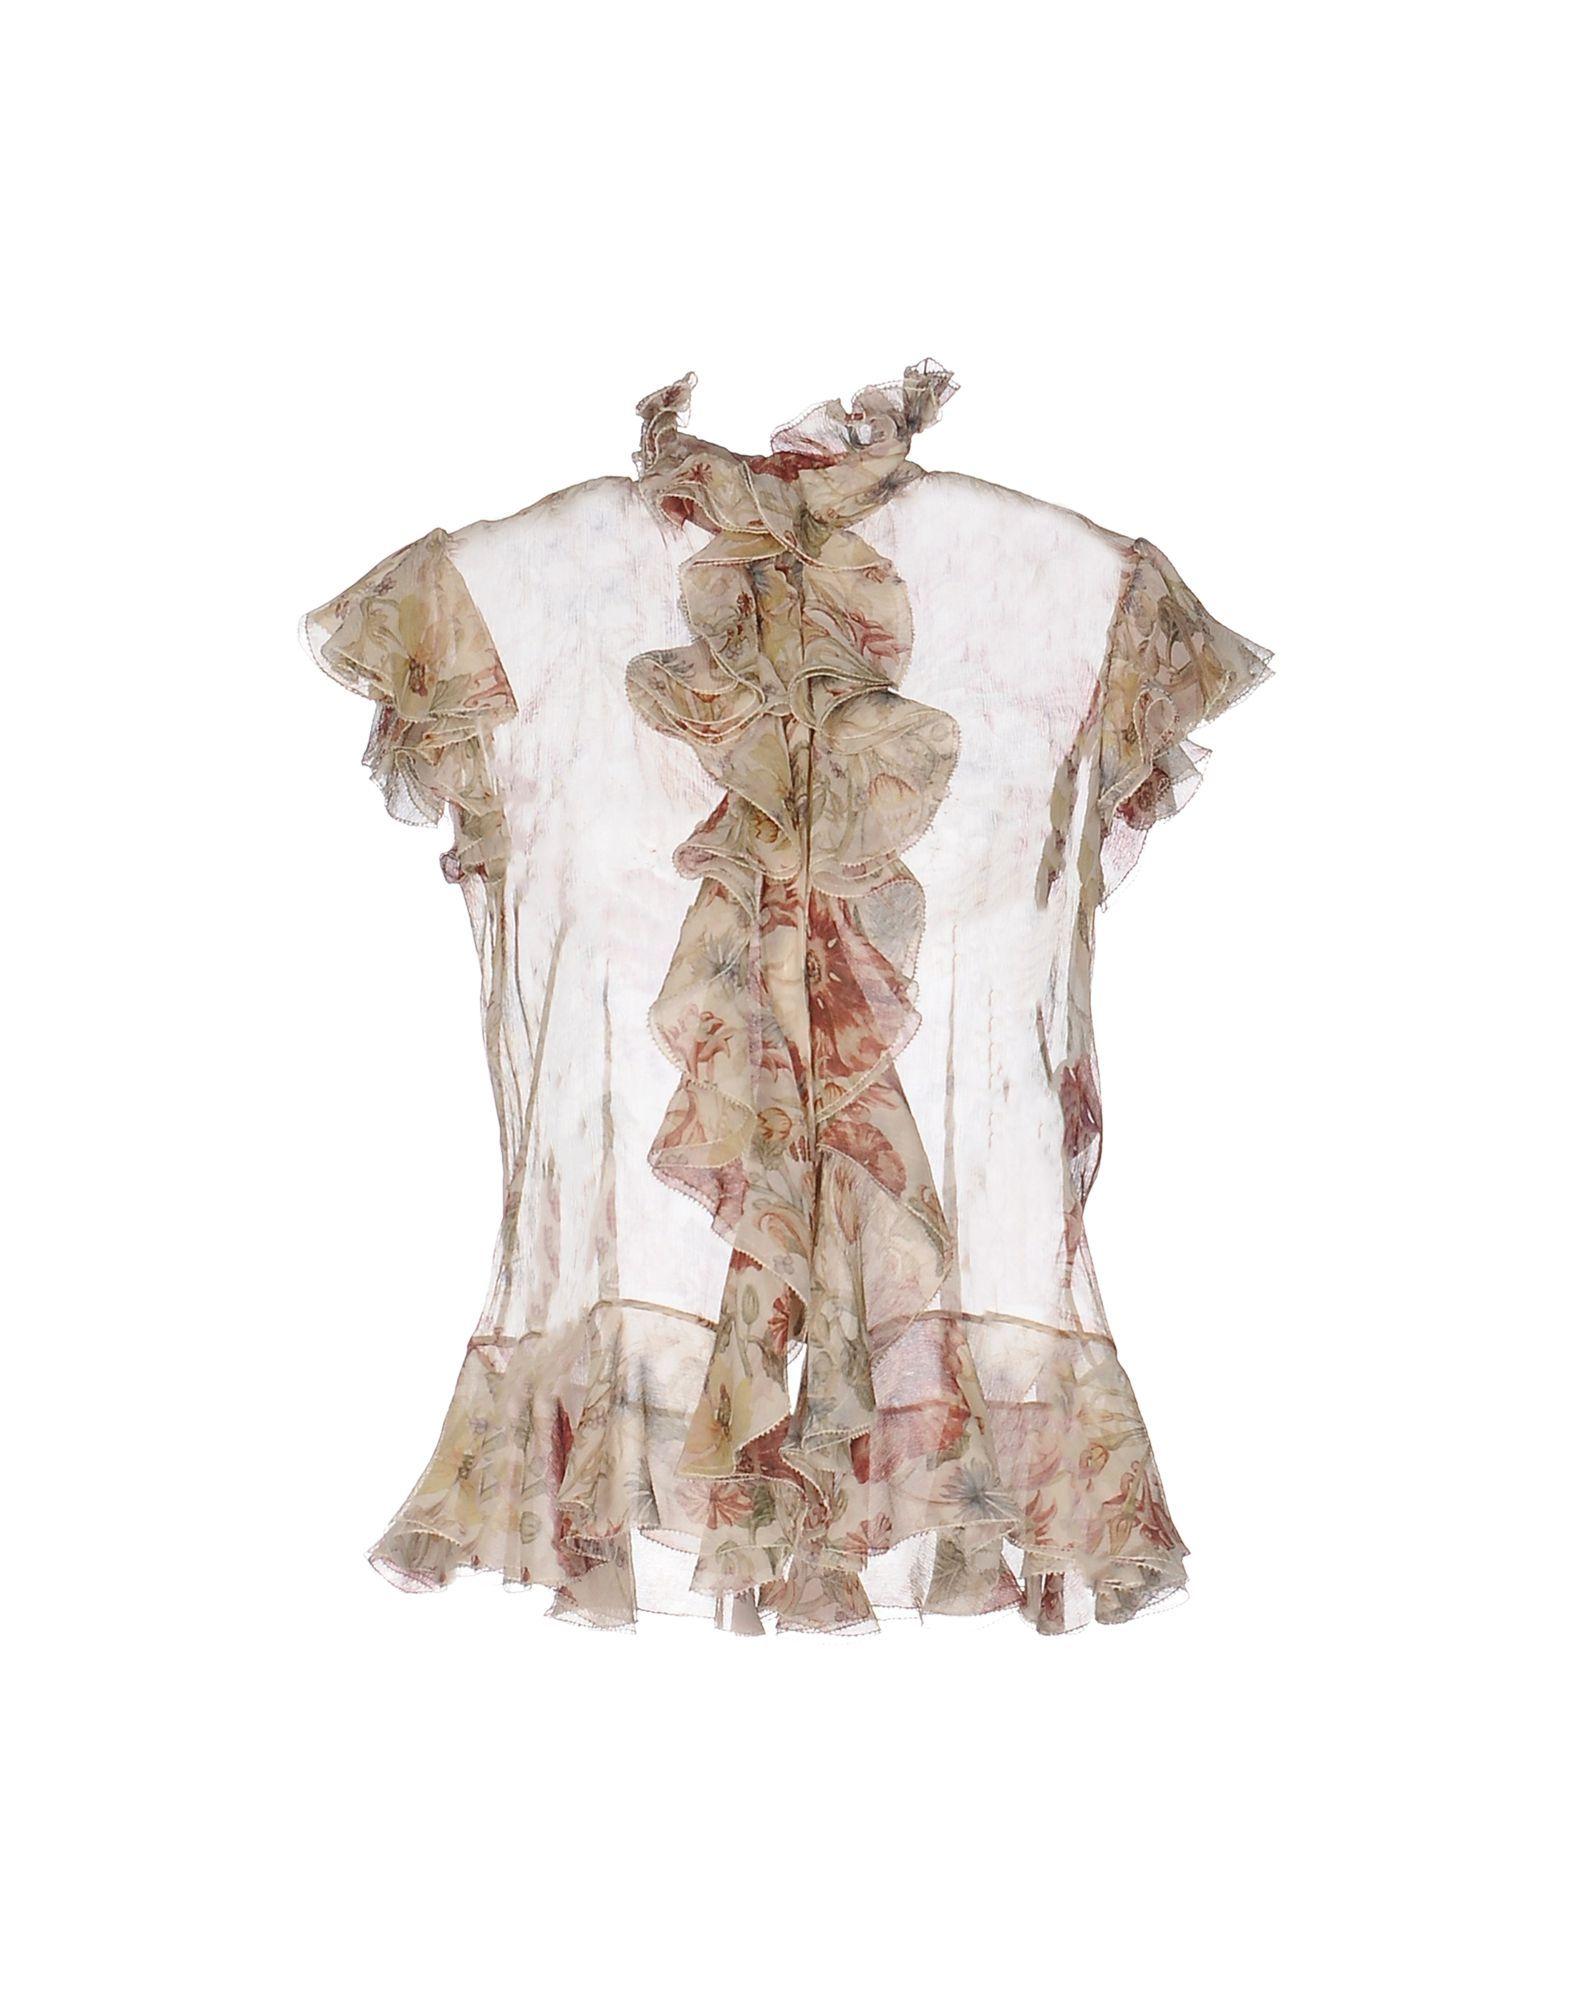 Alexander McQueen Beige Floral Design Silk Blouse